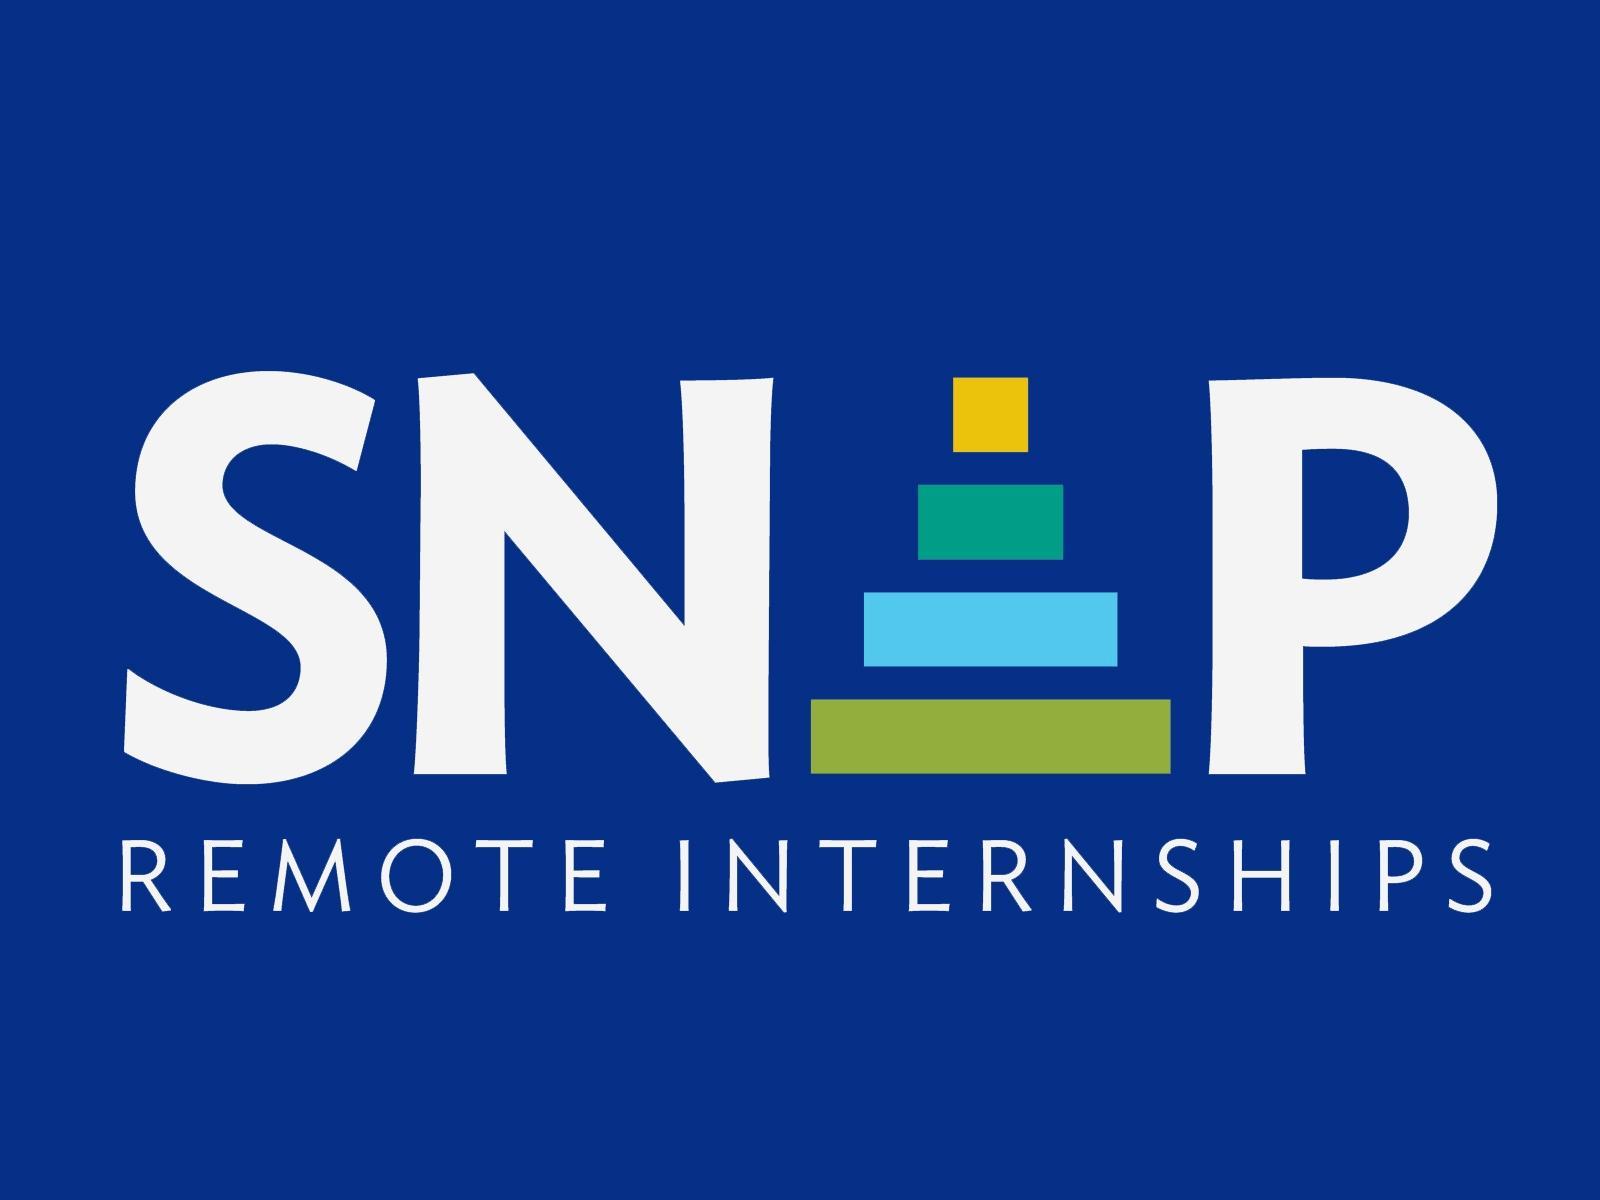 SNAP Remote Internships